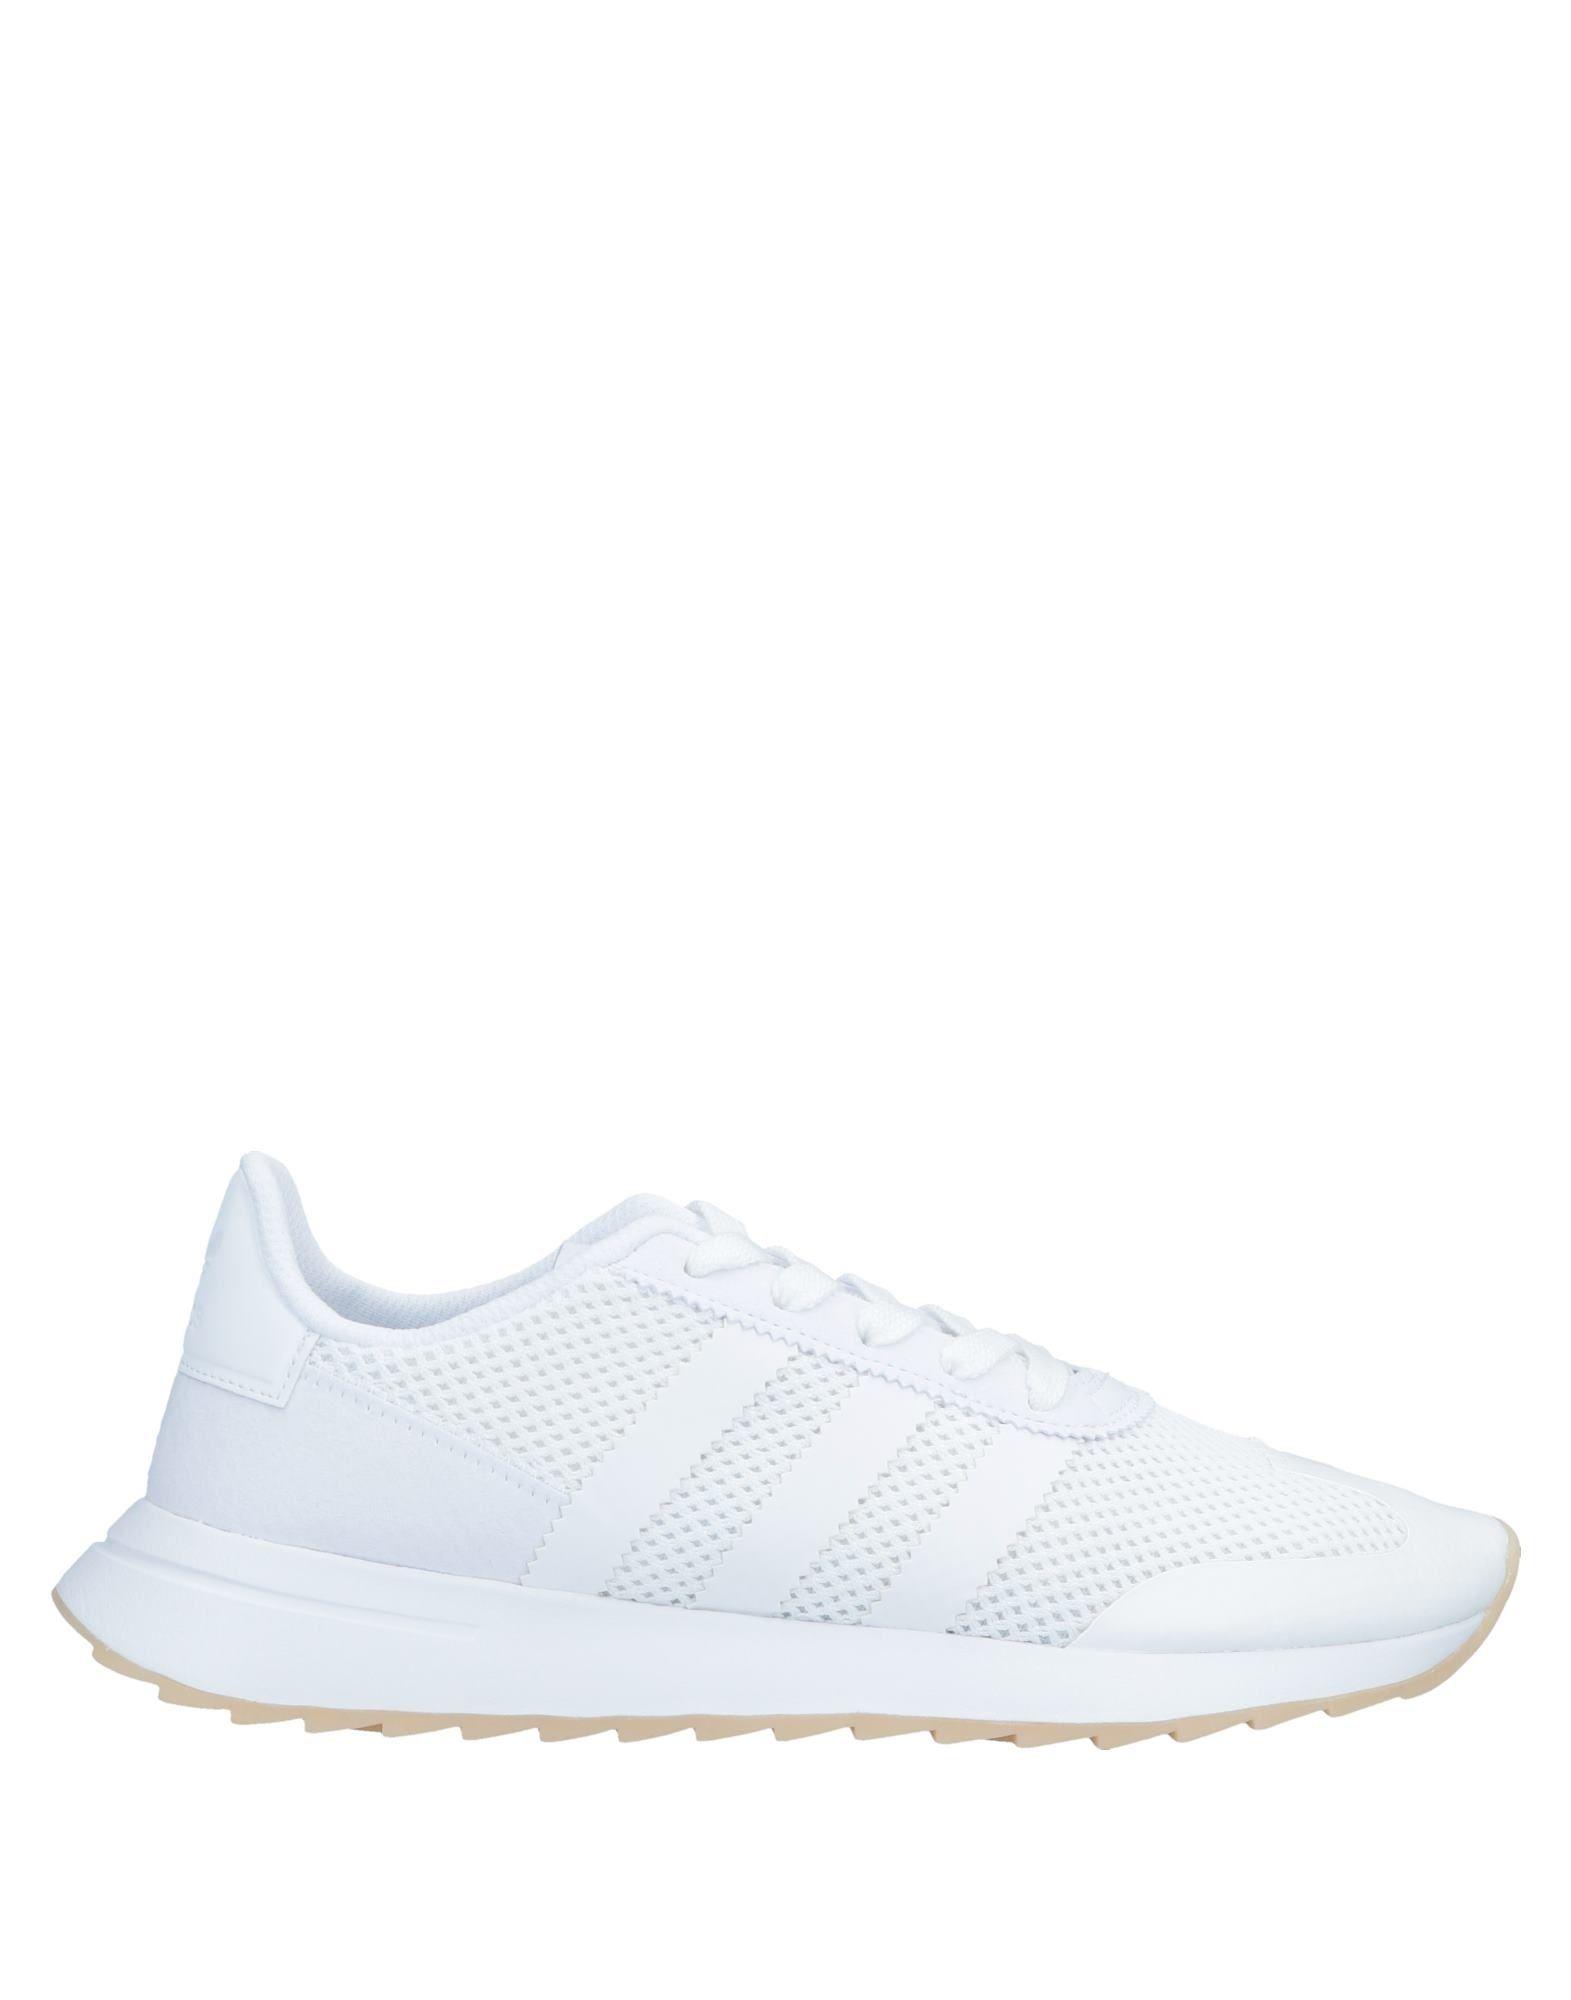 Turnschuhe Adidas Originals damen - 11610517IO